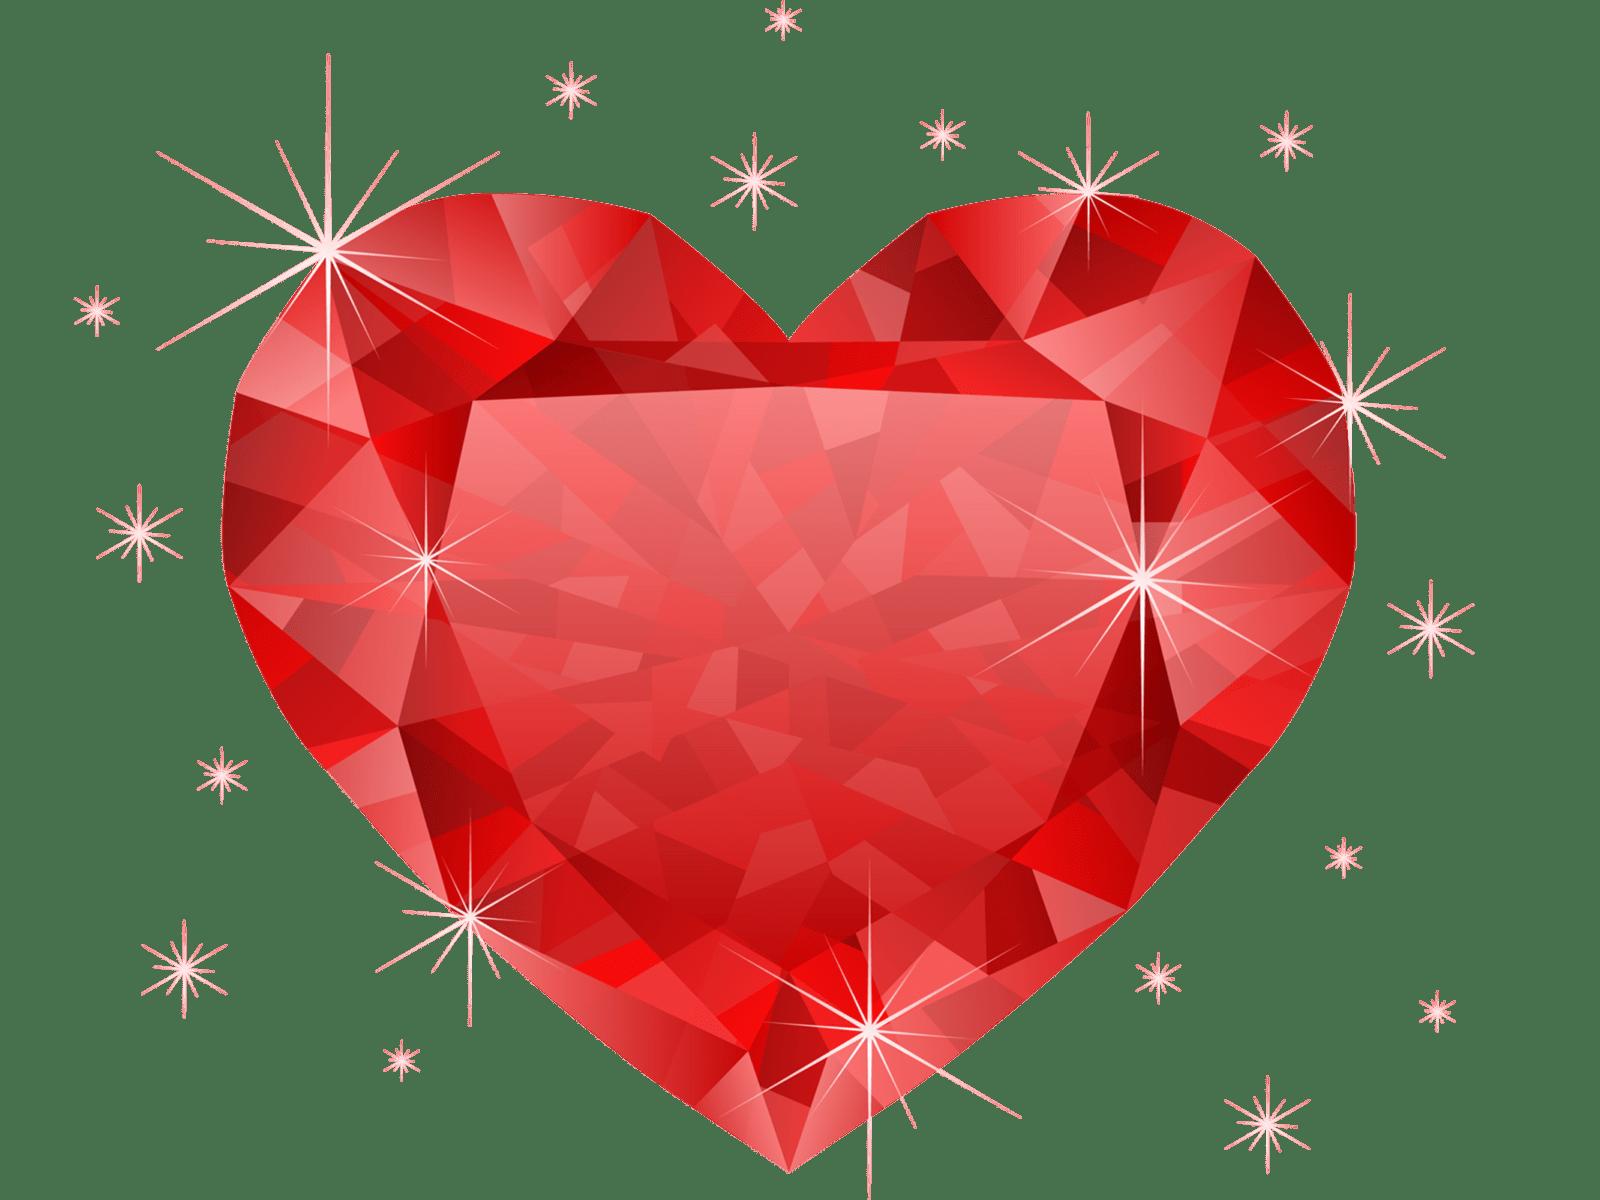 Hd Lock Screen Wallpaper Android Ruby Heart Wallpaper Hd Wallpapers13 Com